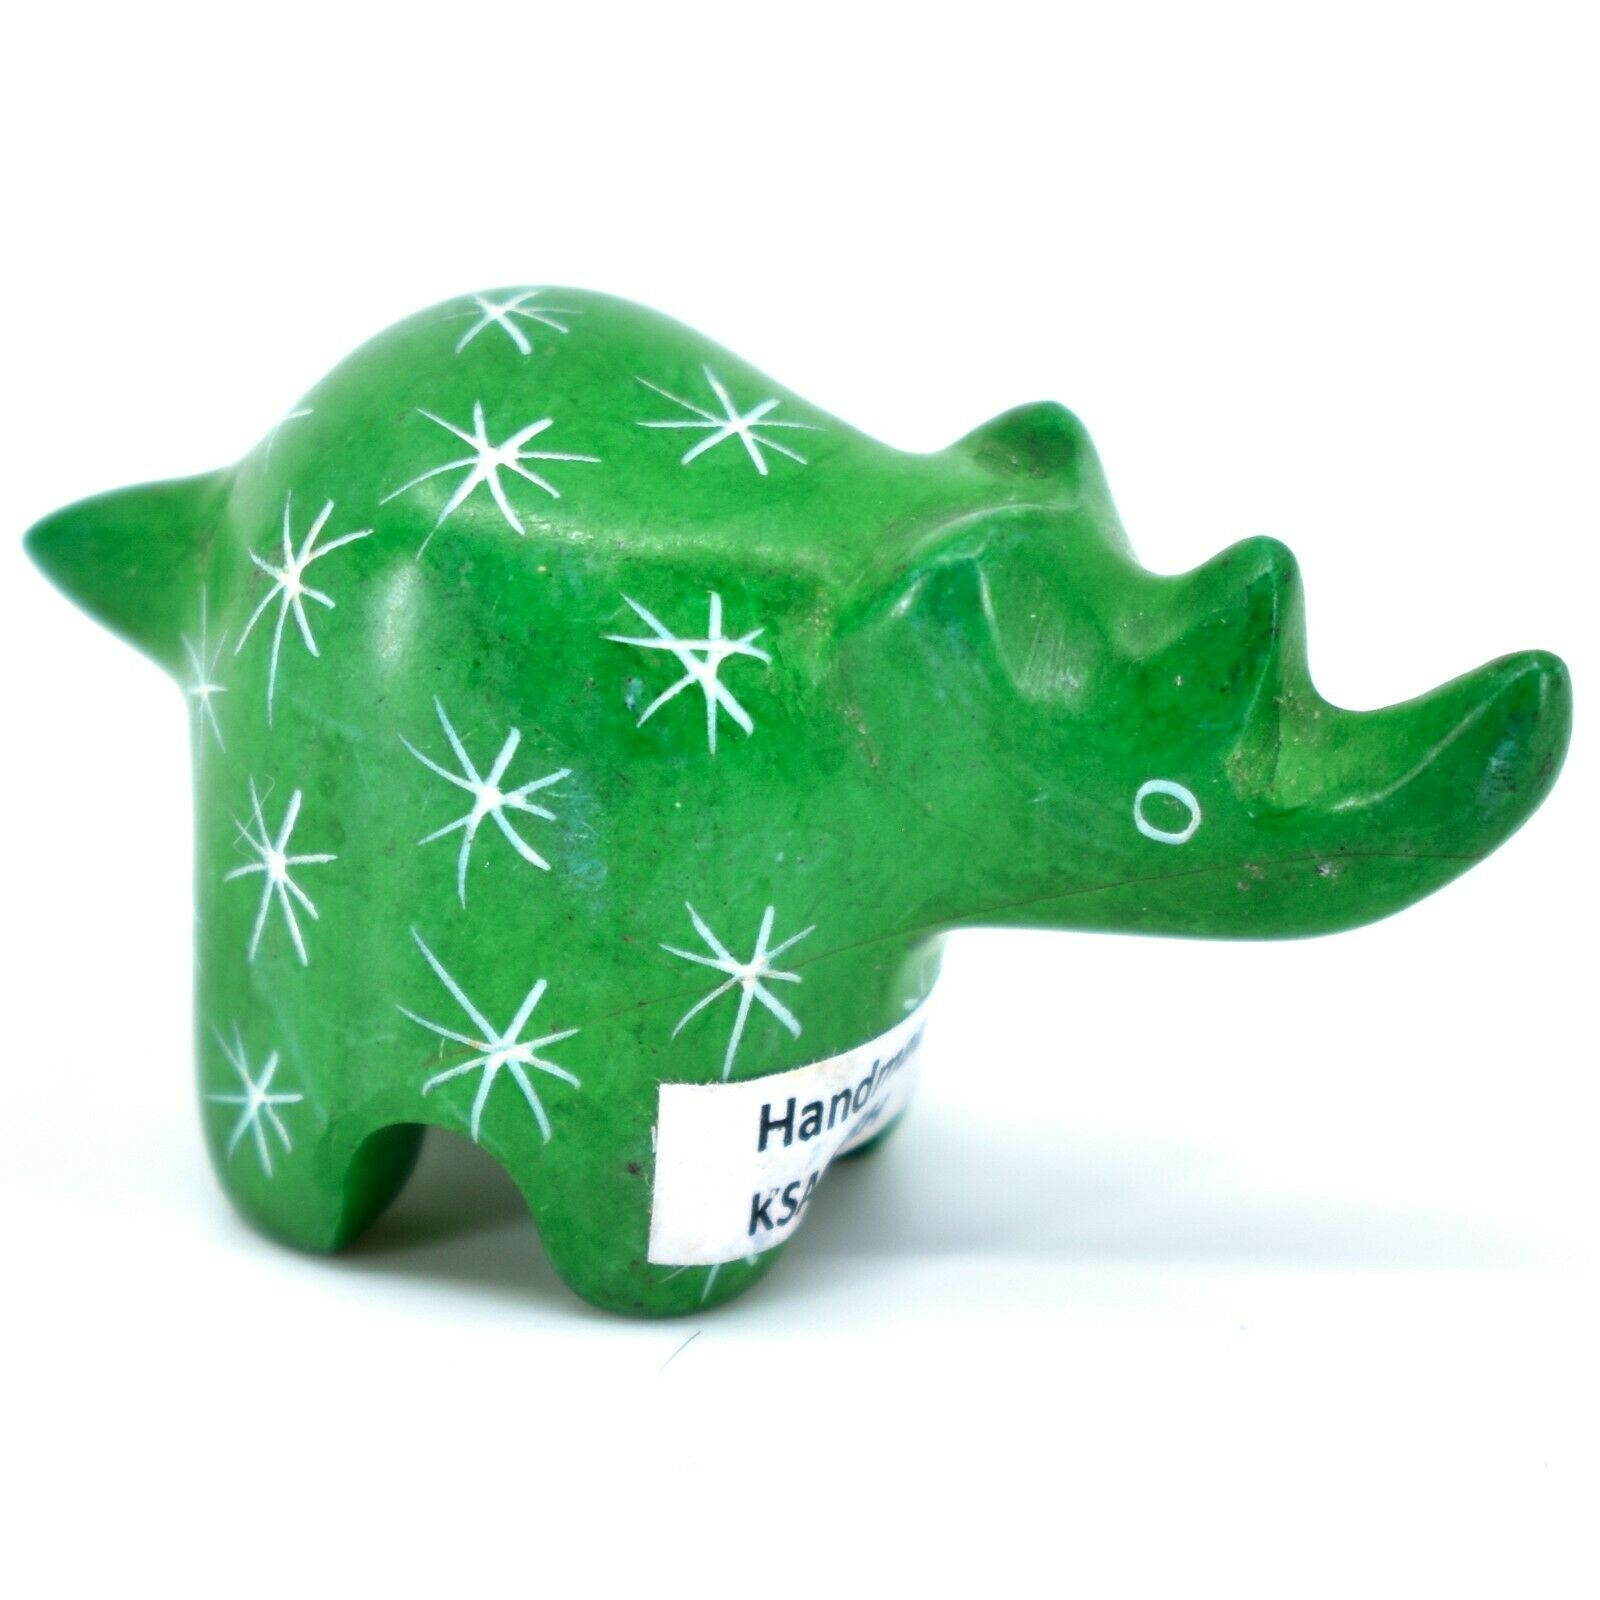 SMOLArt Hand Carved Soapstone Green Rhinoceros Miniature Figurine Made in Kenya